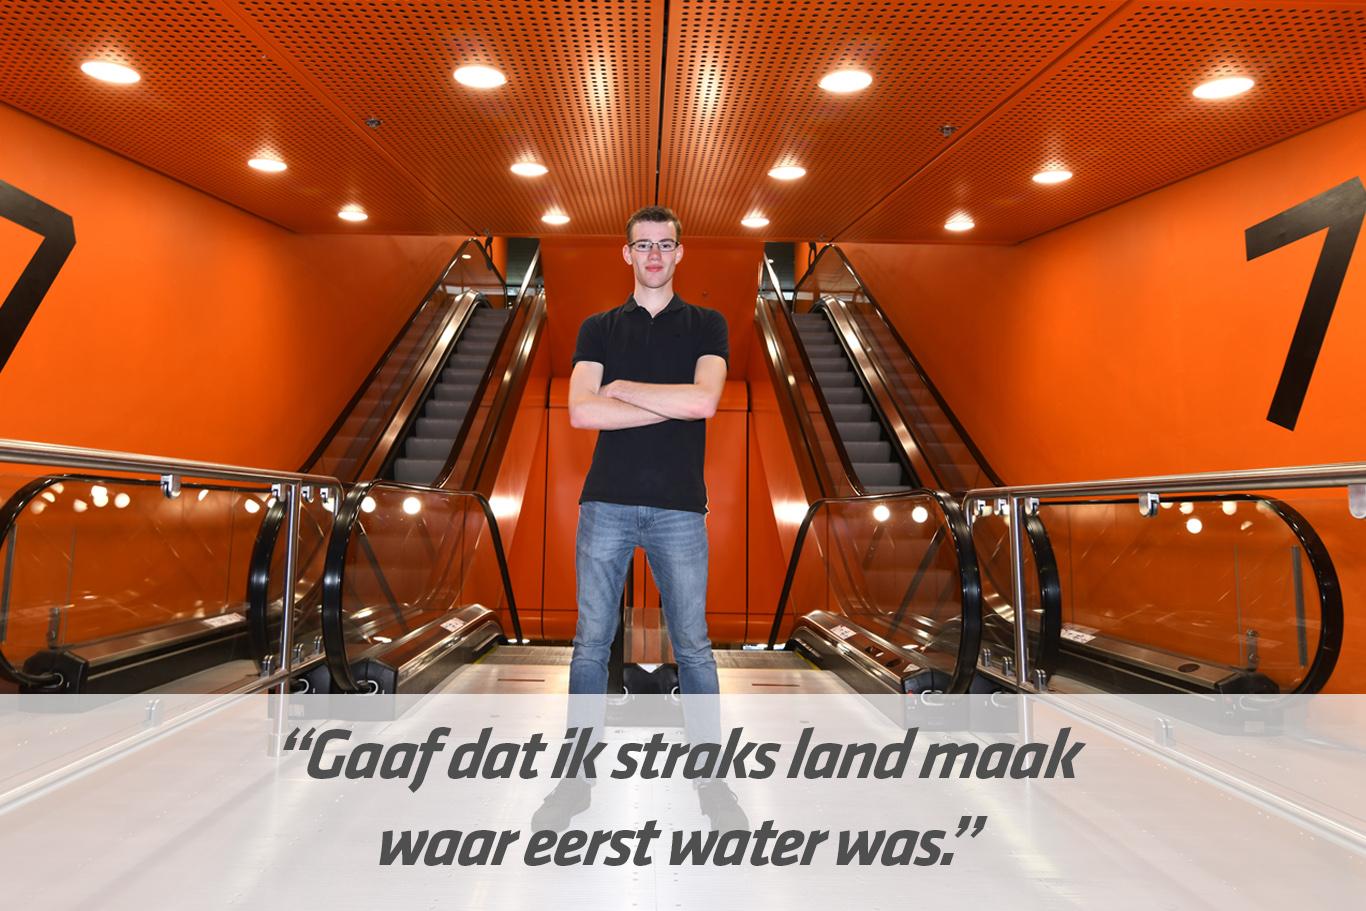 Mbo-opleiding Maritiem waterbouwer / stuurman waterbouw | STC mbo college Rotterdam